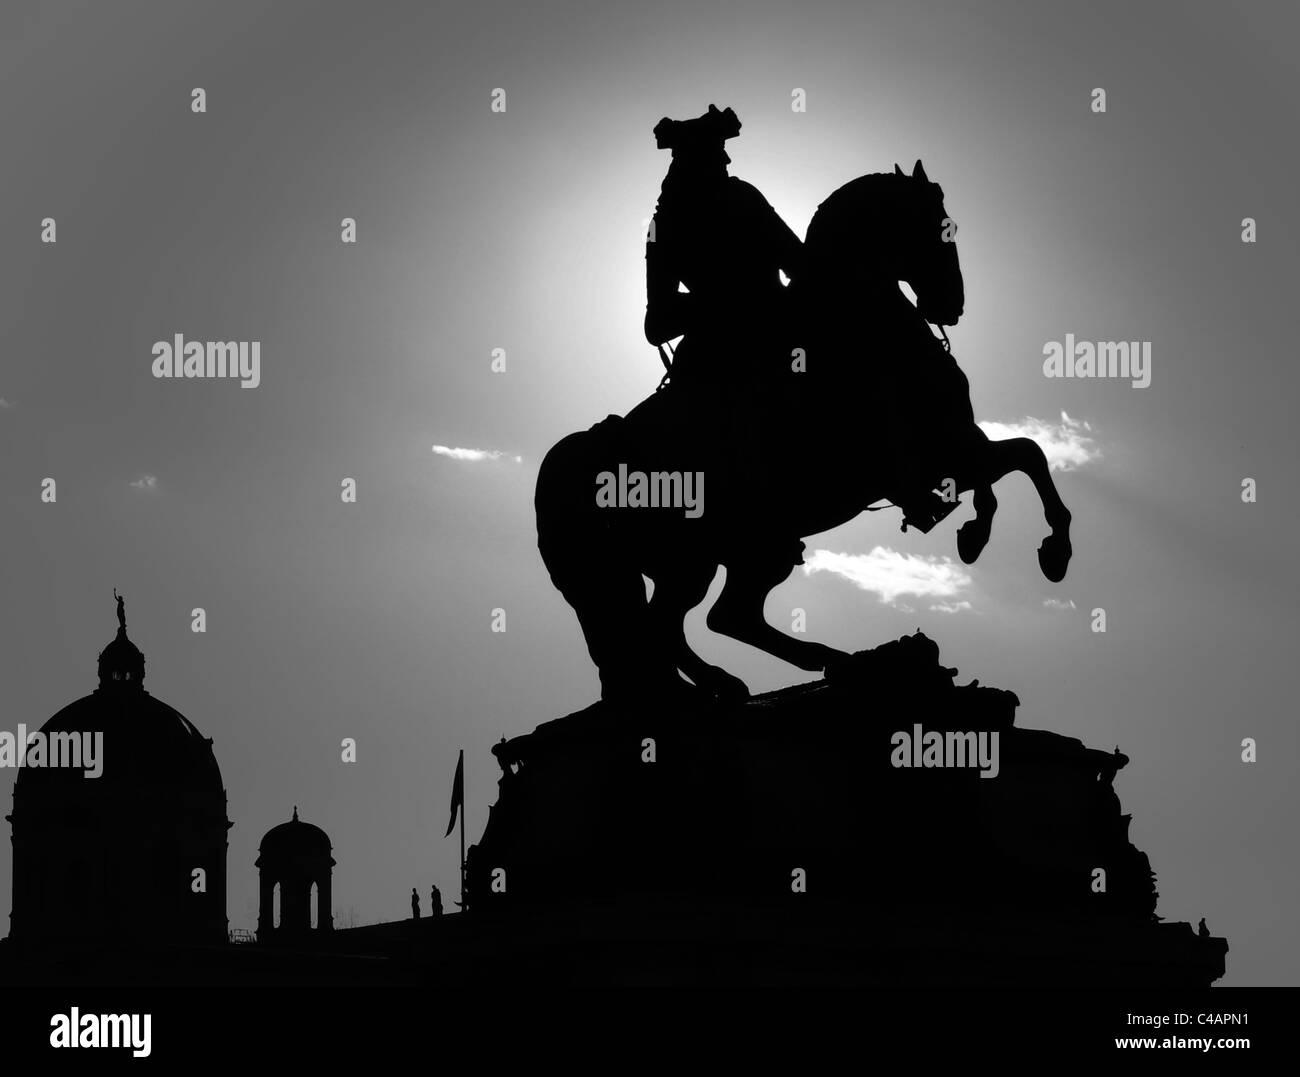 silhouette of a rider staute at vienna's heldenplatz - Stock Image